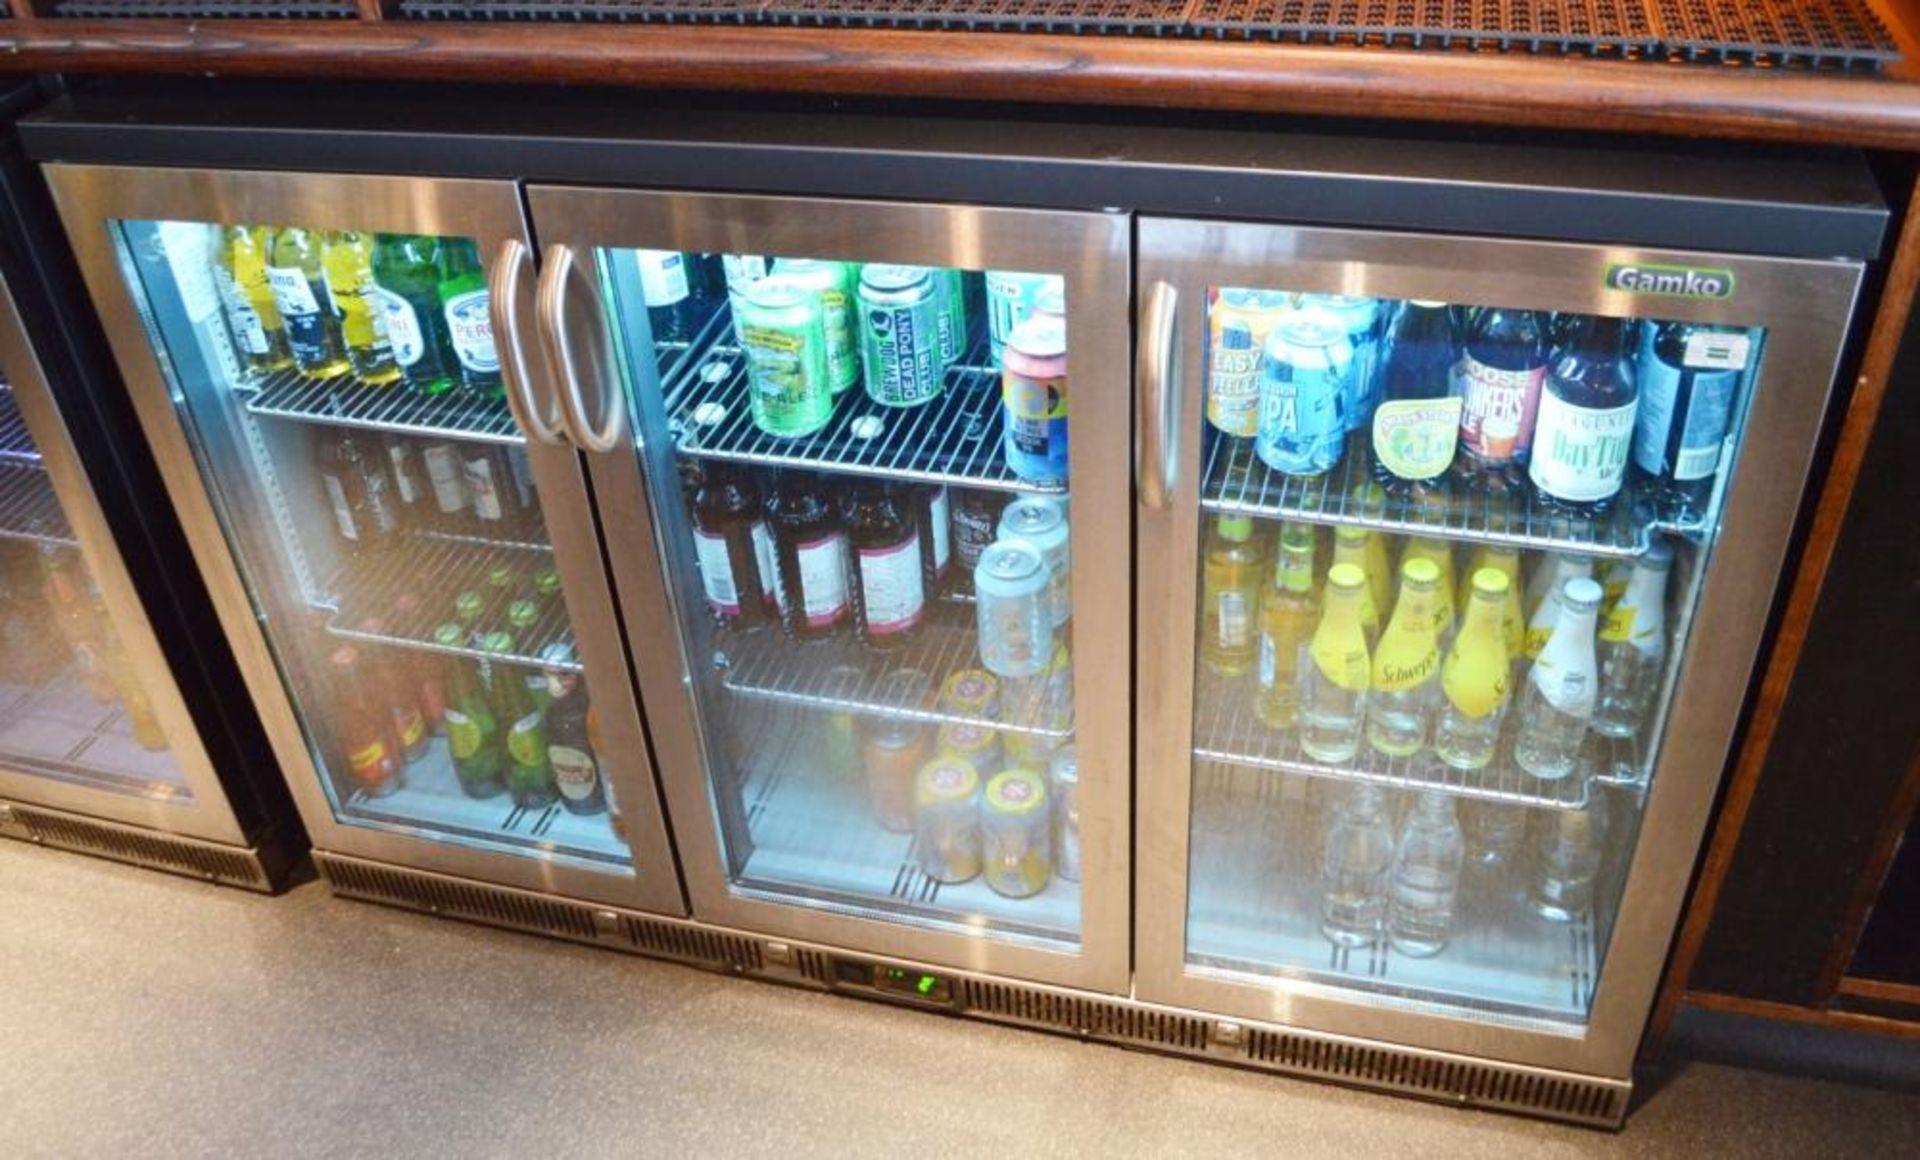 Lot 123 - 1 x Gamko High Capacity Triple Hinged Door Backbar Bottle Cooler - Stainless Steel Finish - Model